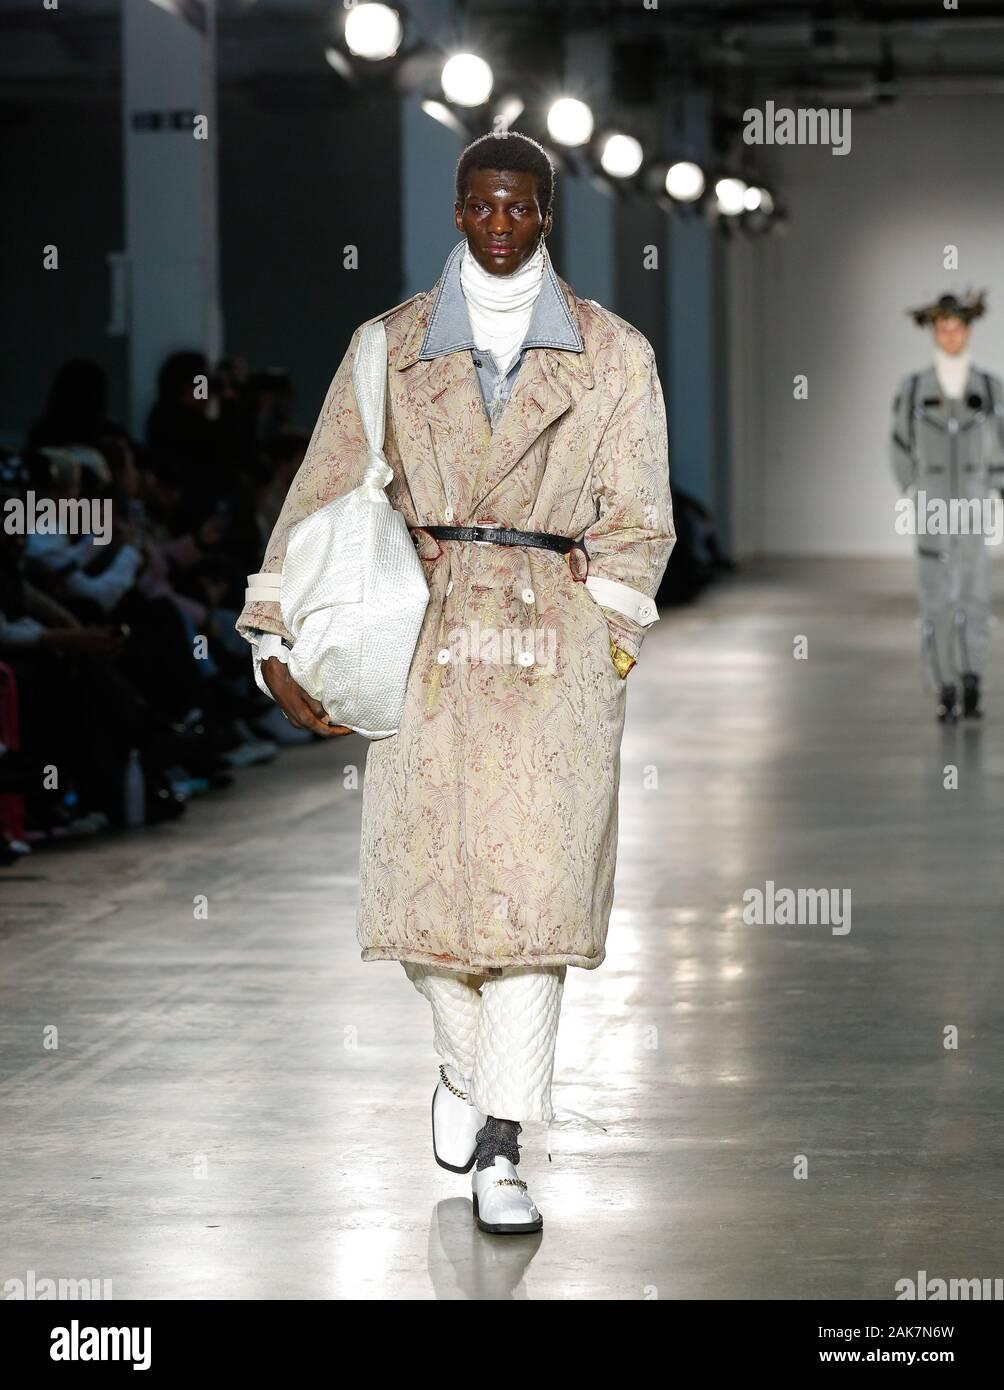 London Uk 5th Jan 2020 Korean Menswear Fashion Designer Hyun Min Han Presenting His Fashion Brand Munn During London Fashion Week Mens Aw2020 Stock Photo Alamy